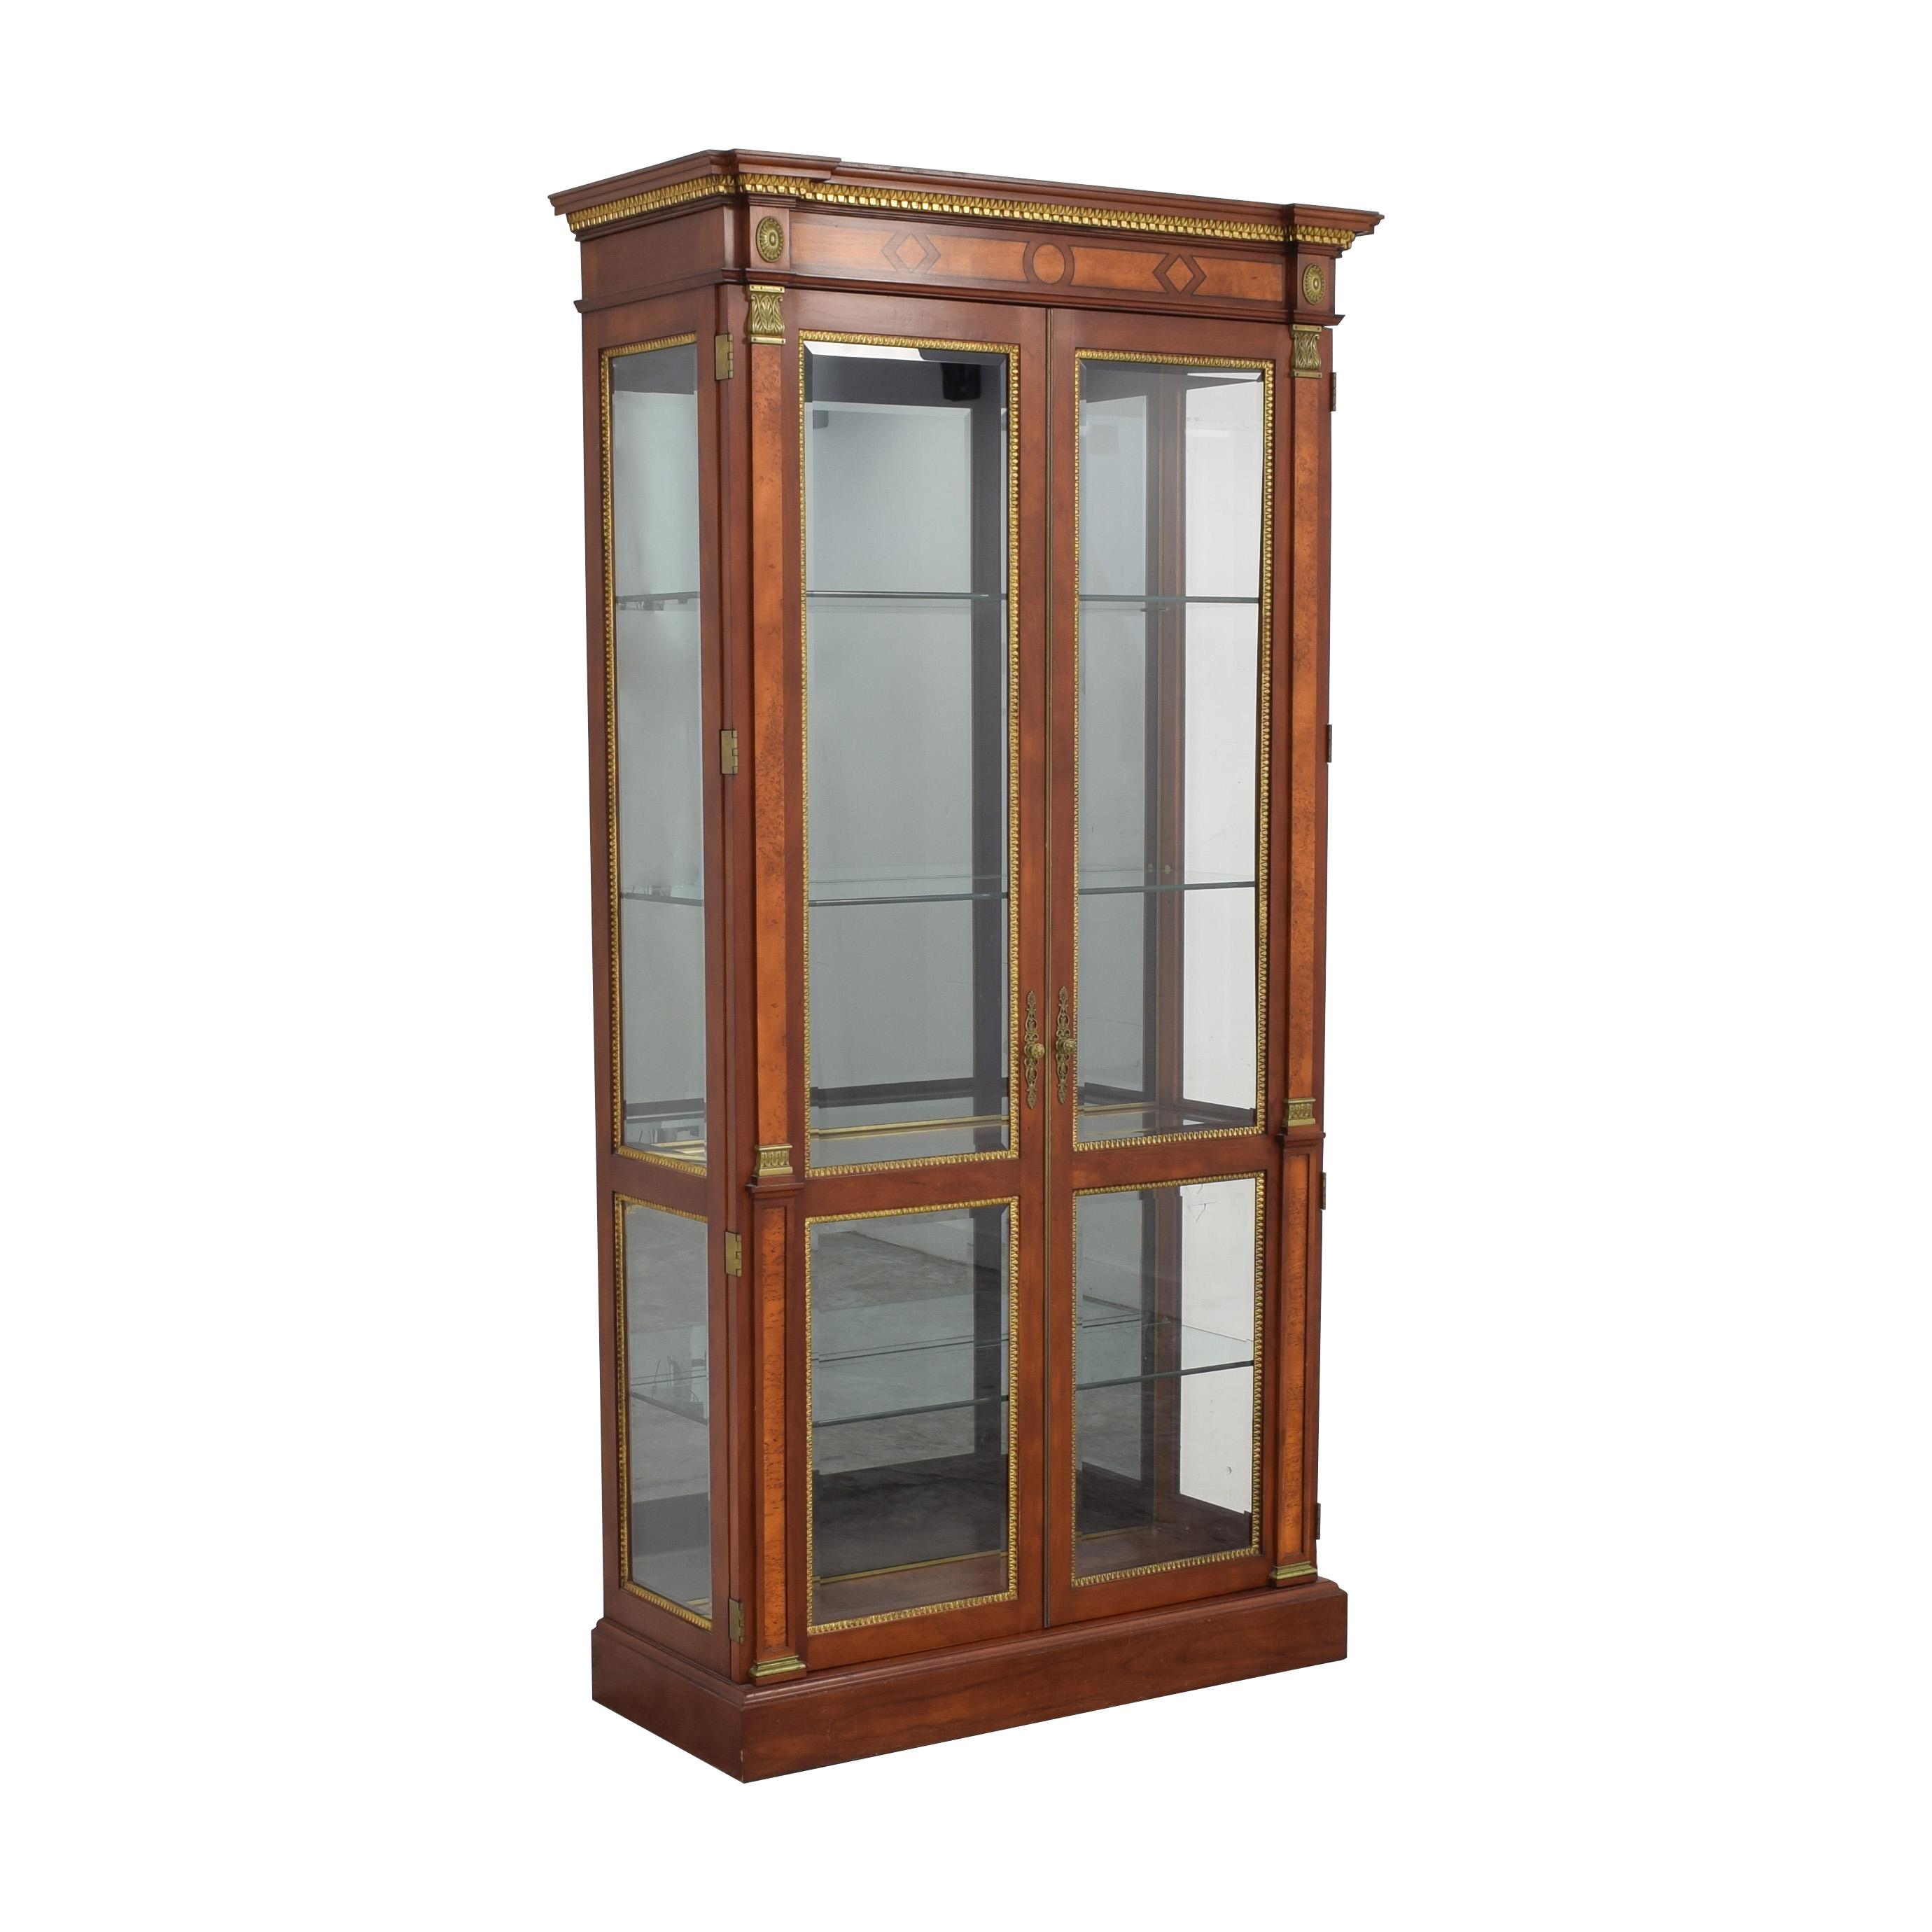 John Widdicomb Co. John Widdicomb Cabinet with Lights Cabinets & Sideboards